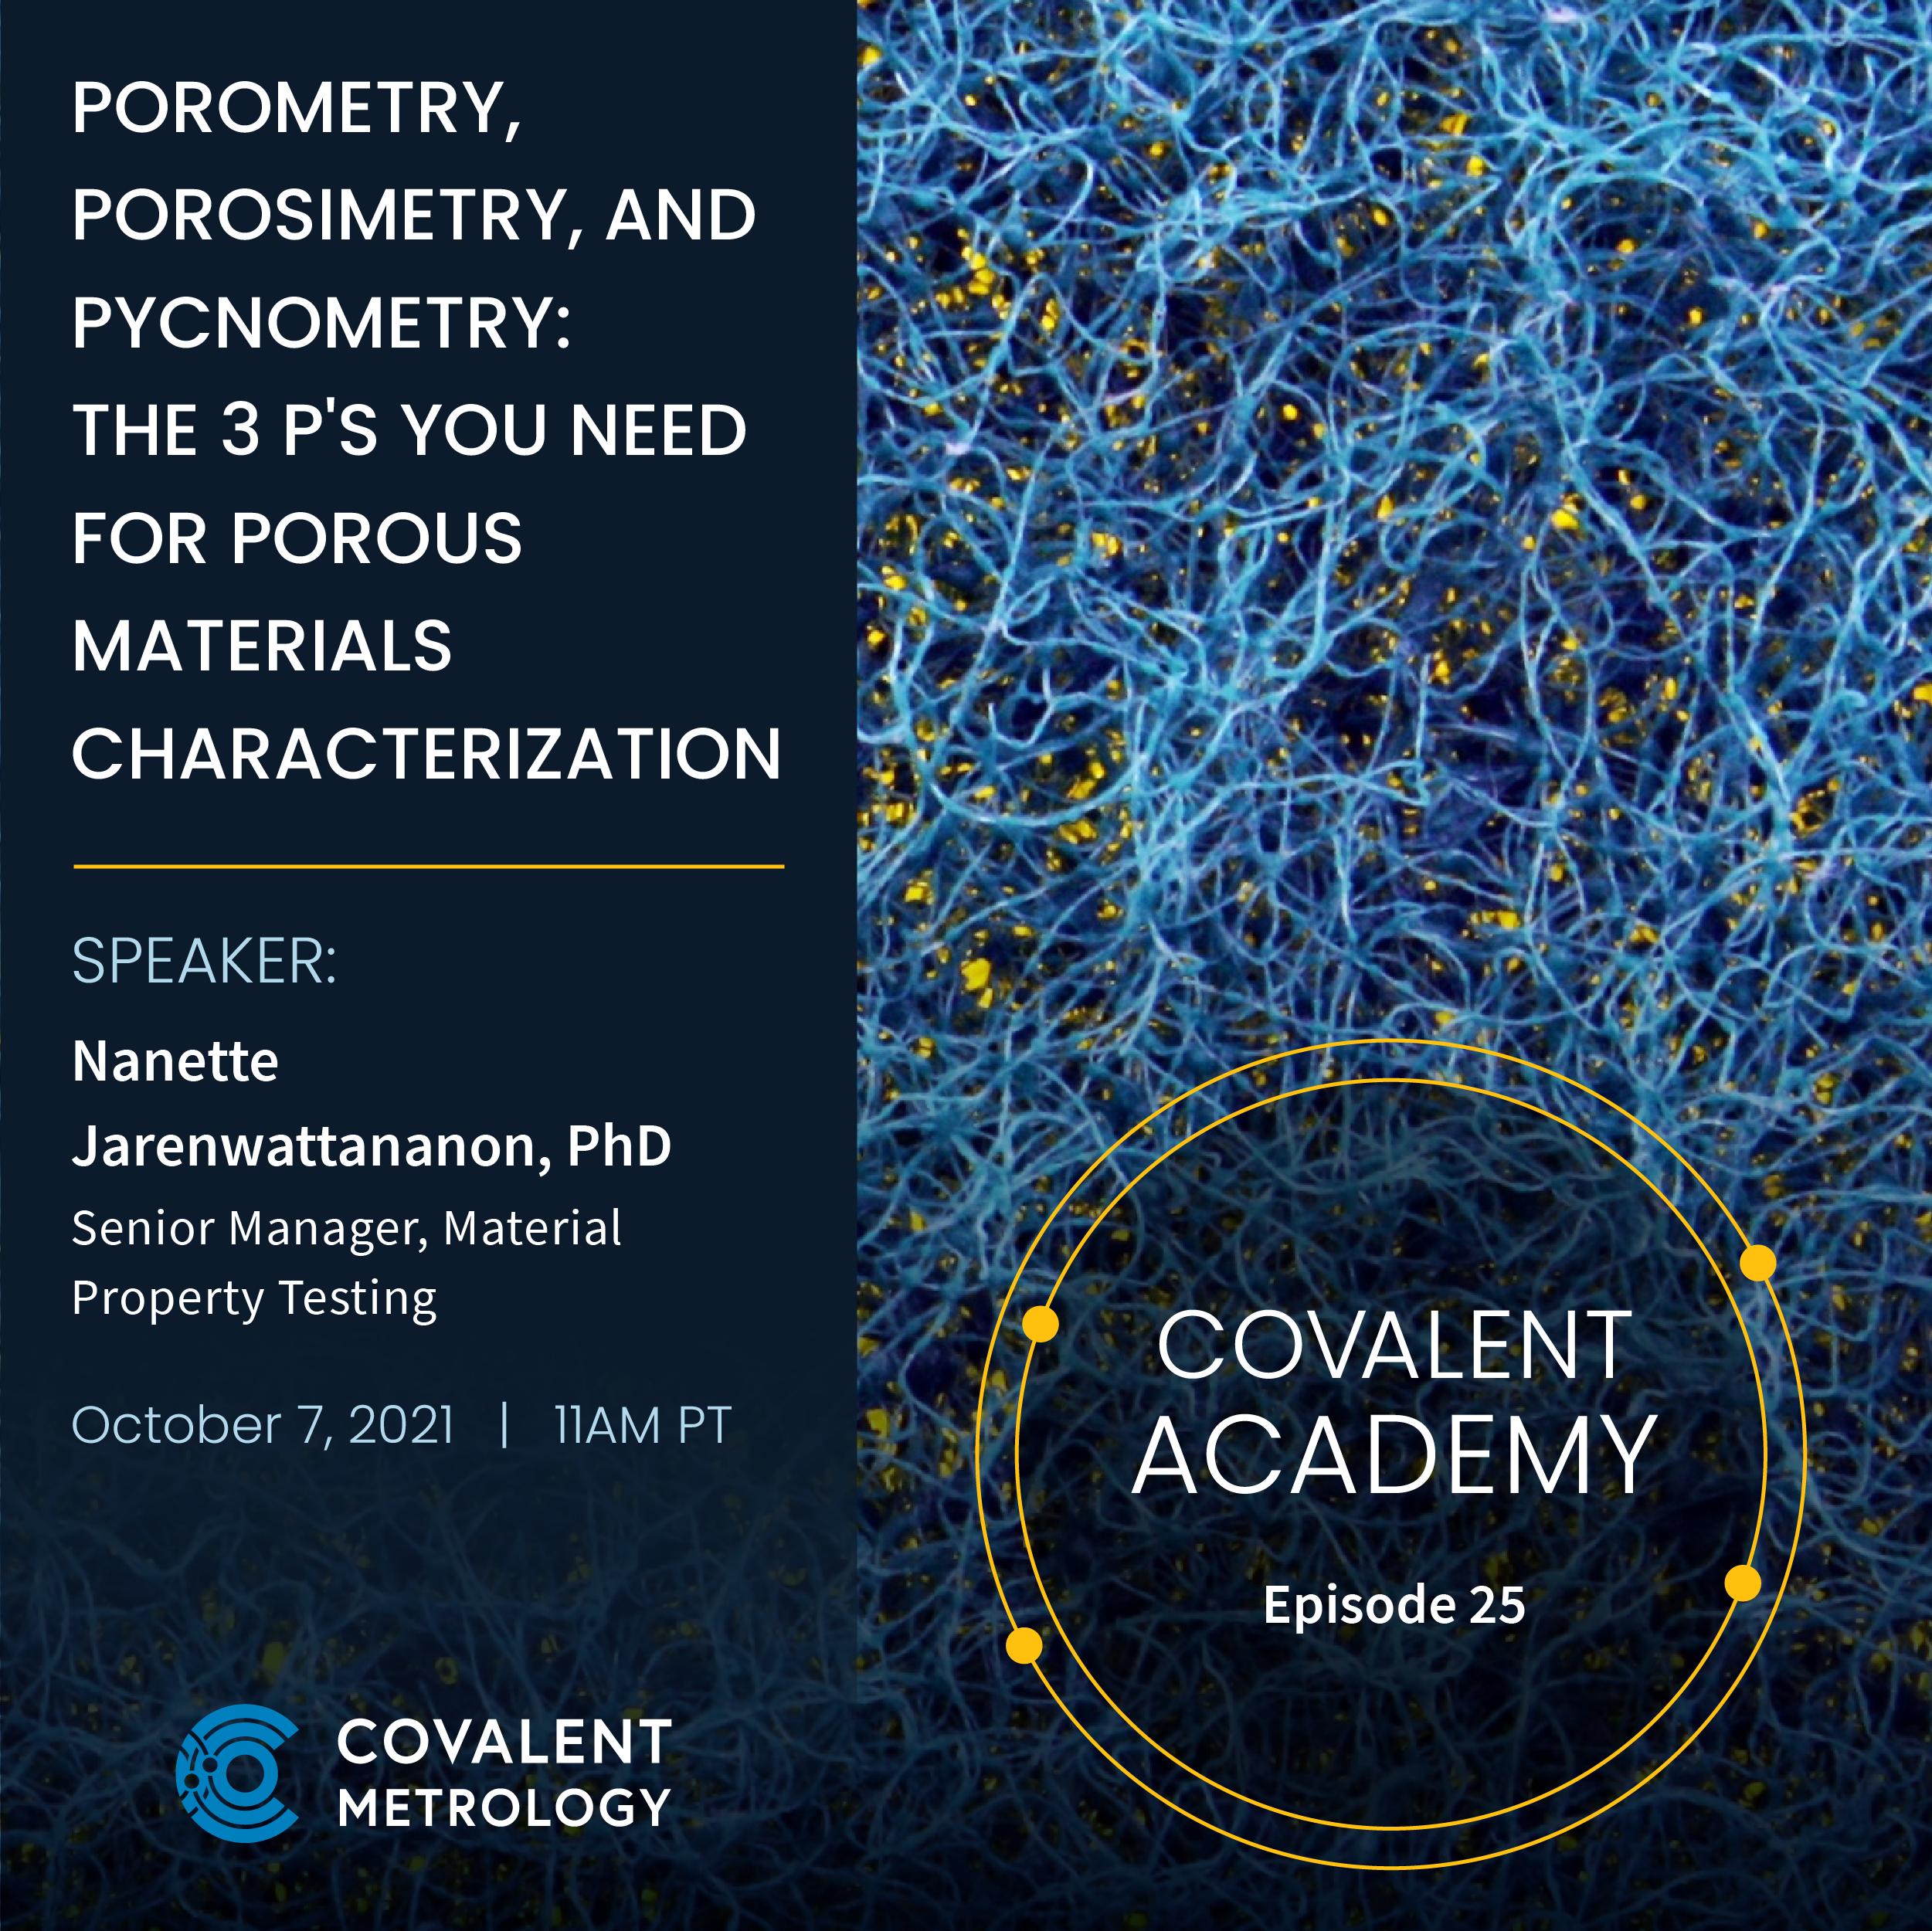 Porometry, Porosimetry, and Pycnometry: the 3 P's You Need for Porous Materials Characterization